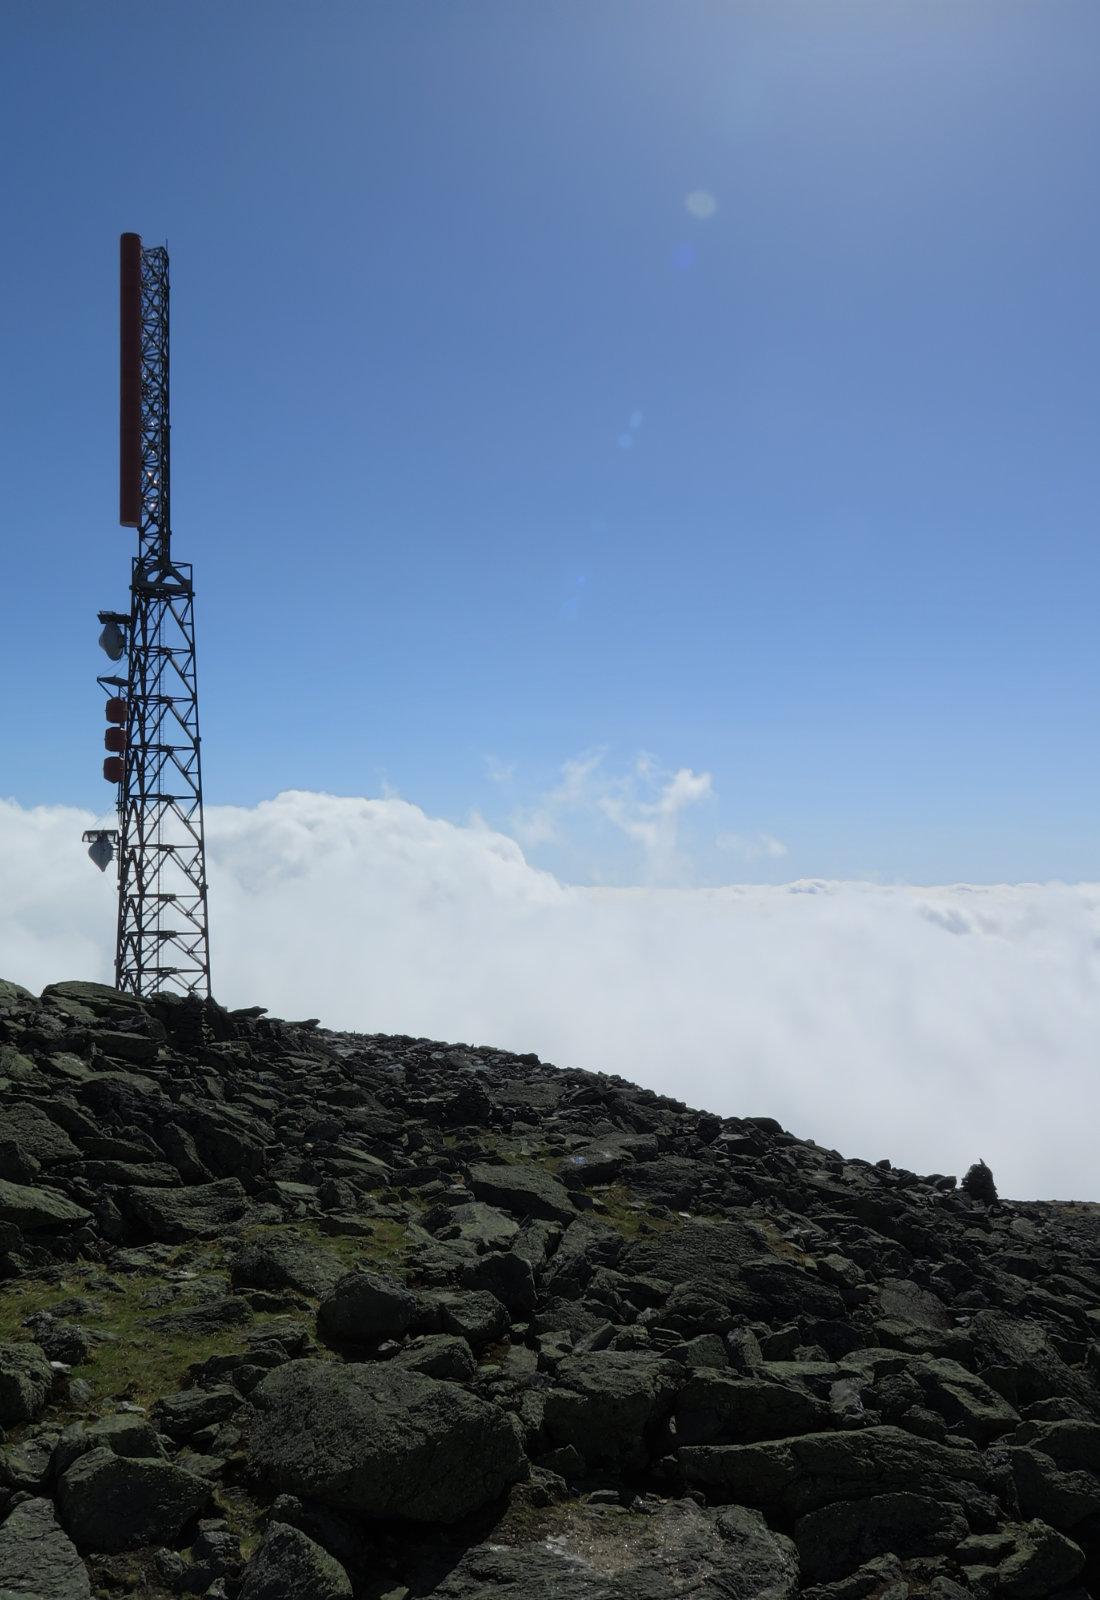 20180602-Washington-tower-clouds